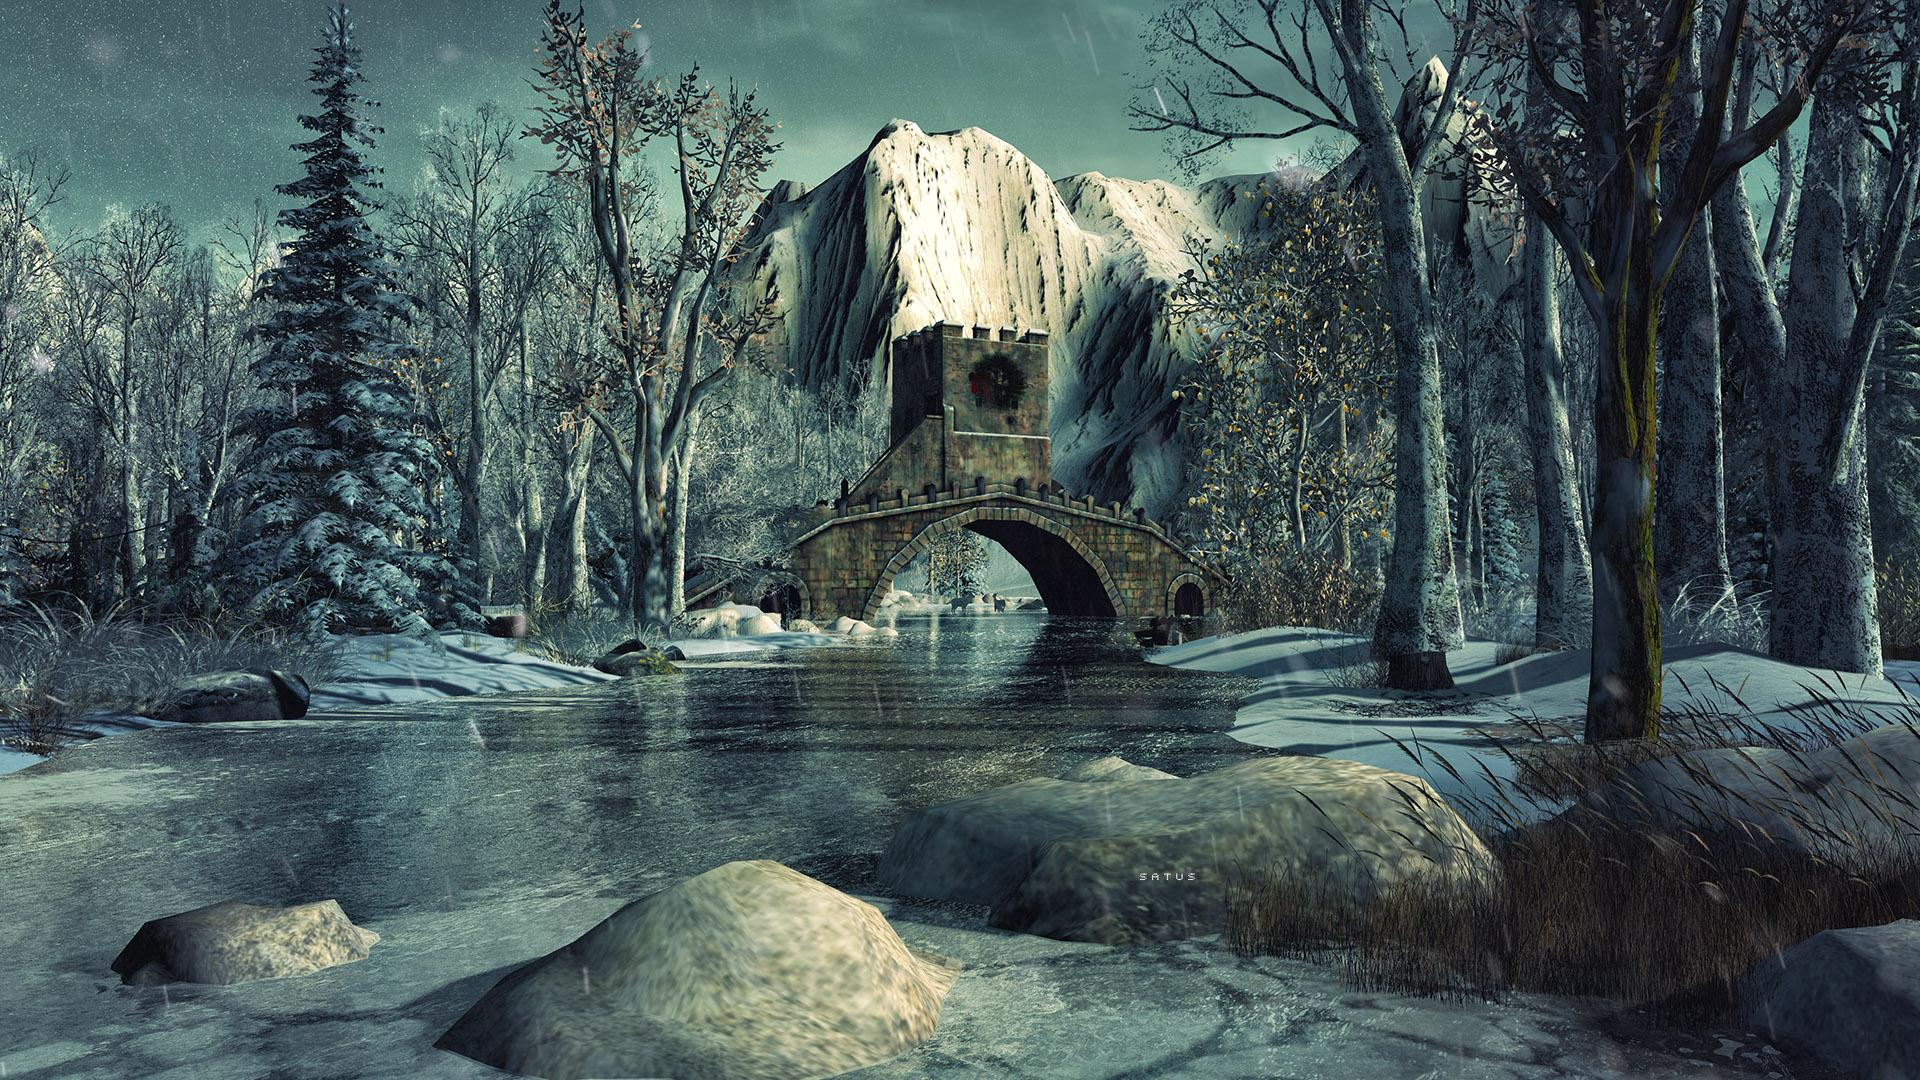 SL Travel: Winter Trace - Lonely Bridge